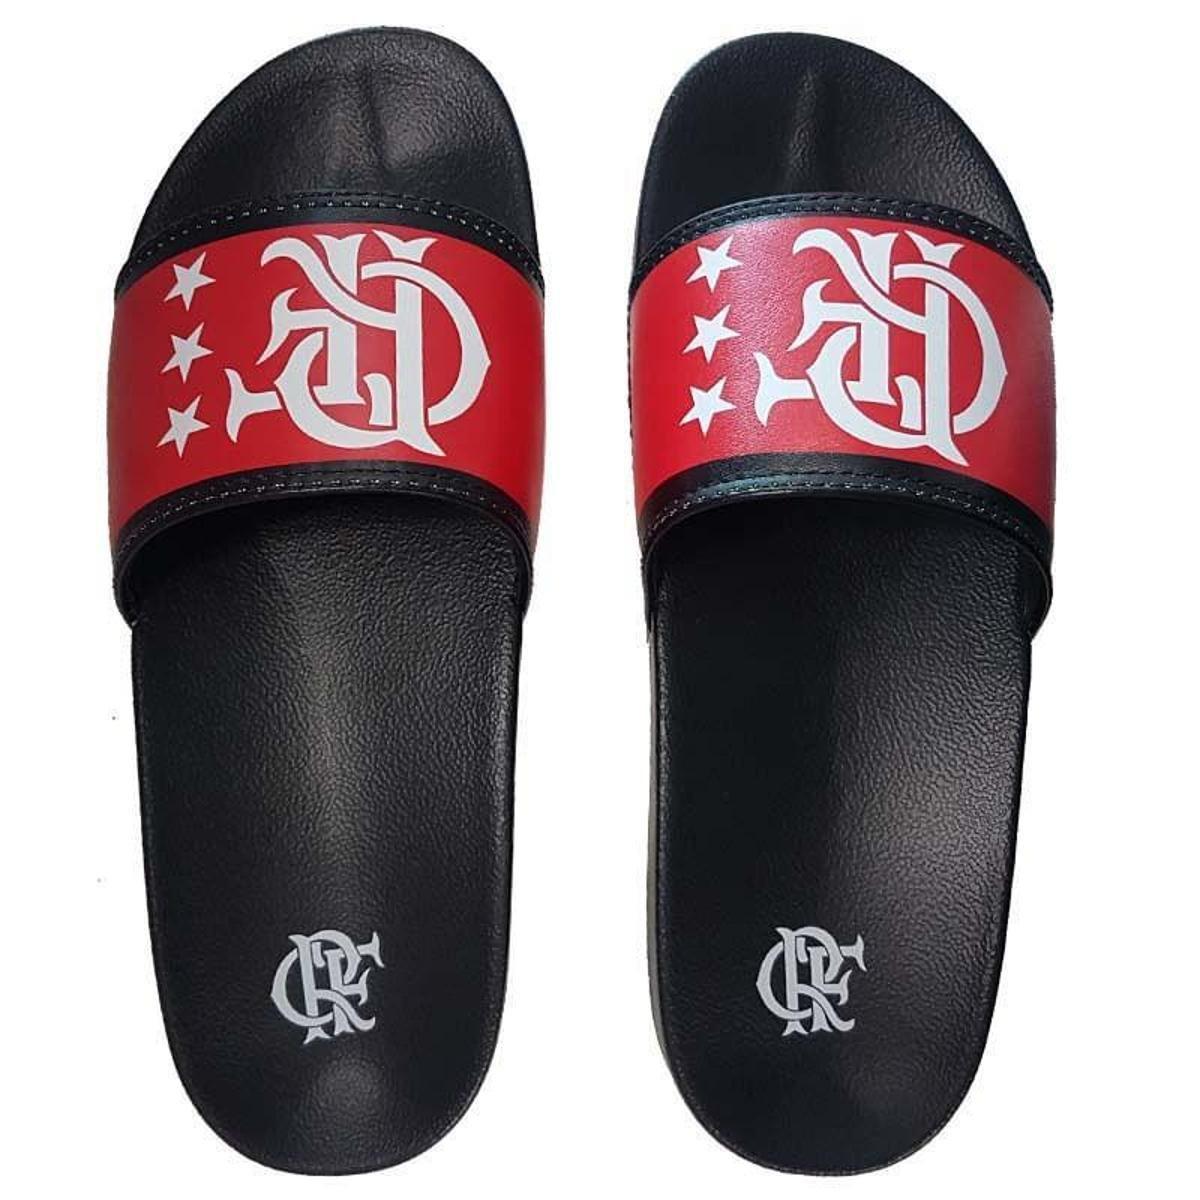 Preto Preto Chinelo Slide Flamengo Chinelo Flamengo e Manto e Flamengo Manto Slide Manto Chinelo Slide Vermelho Vermelho vxnqSCAw6n